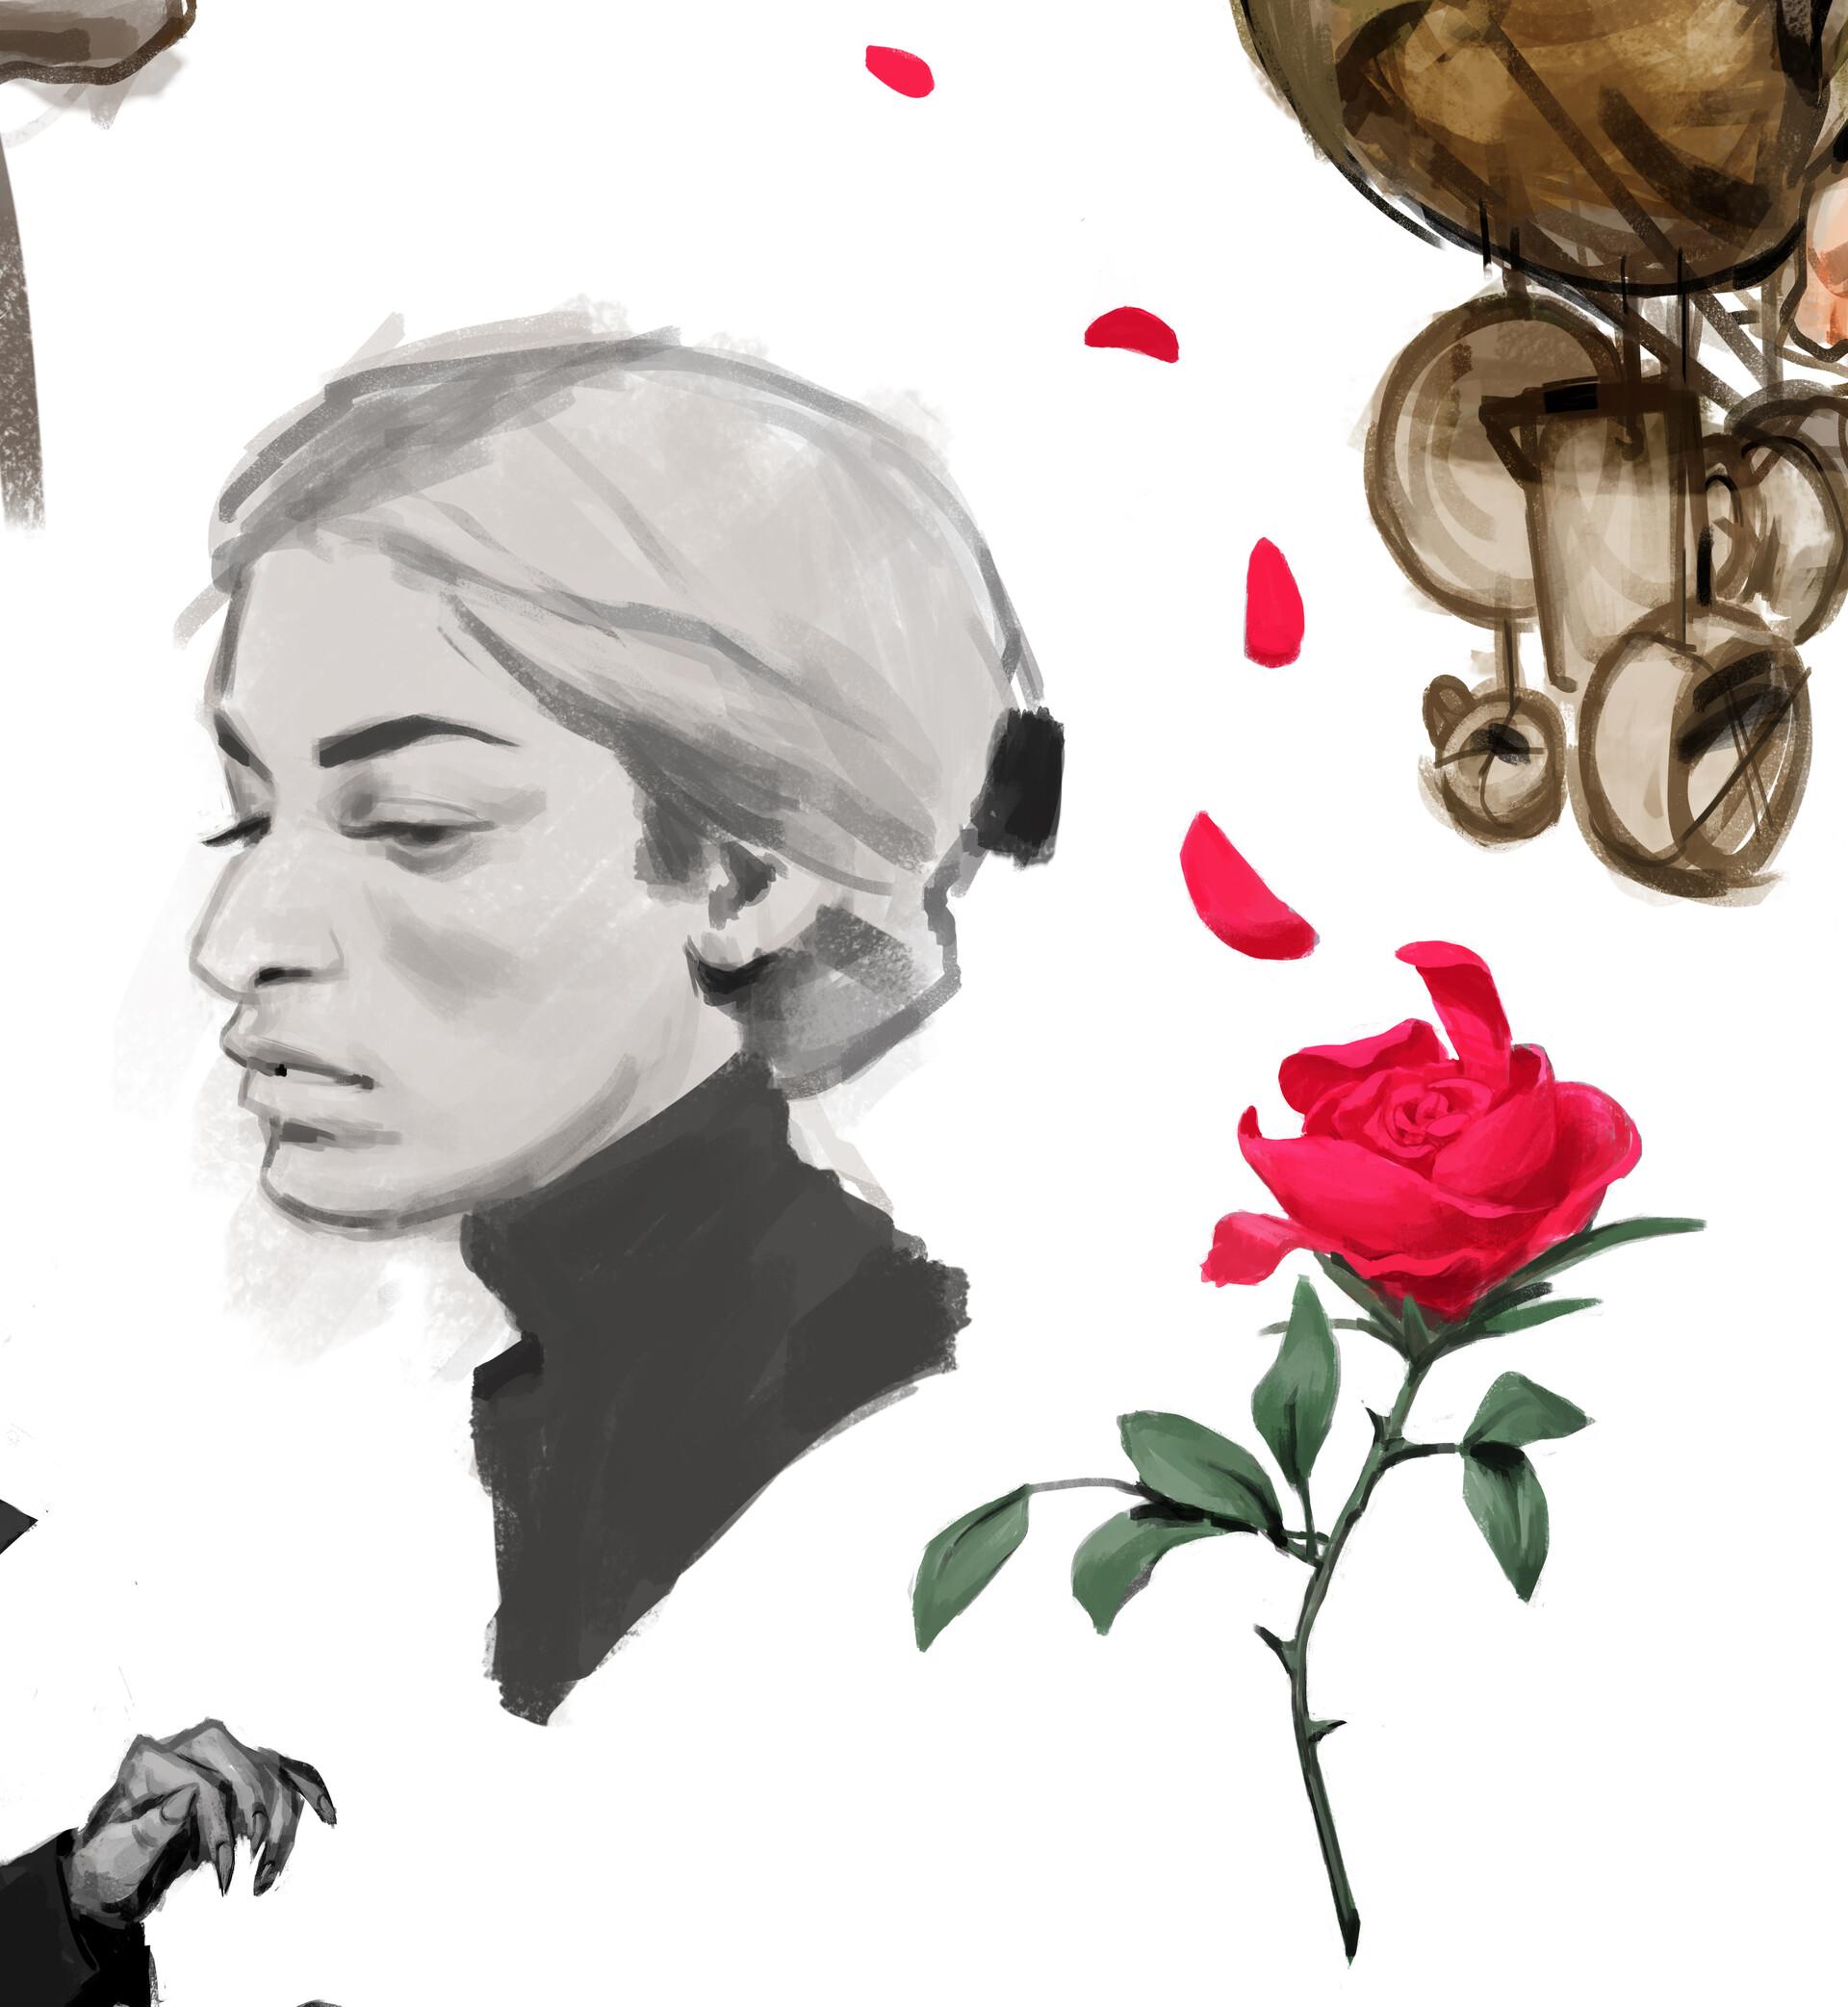 Jens claessens rose